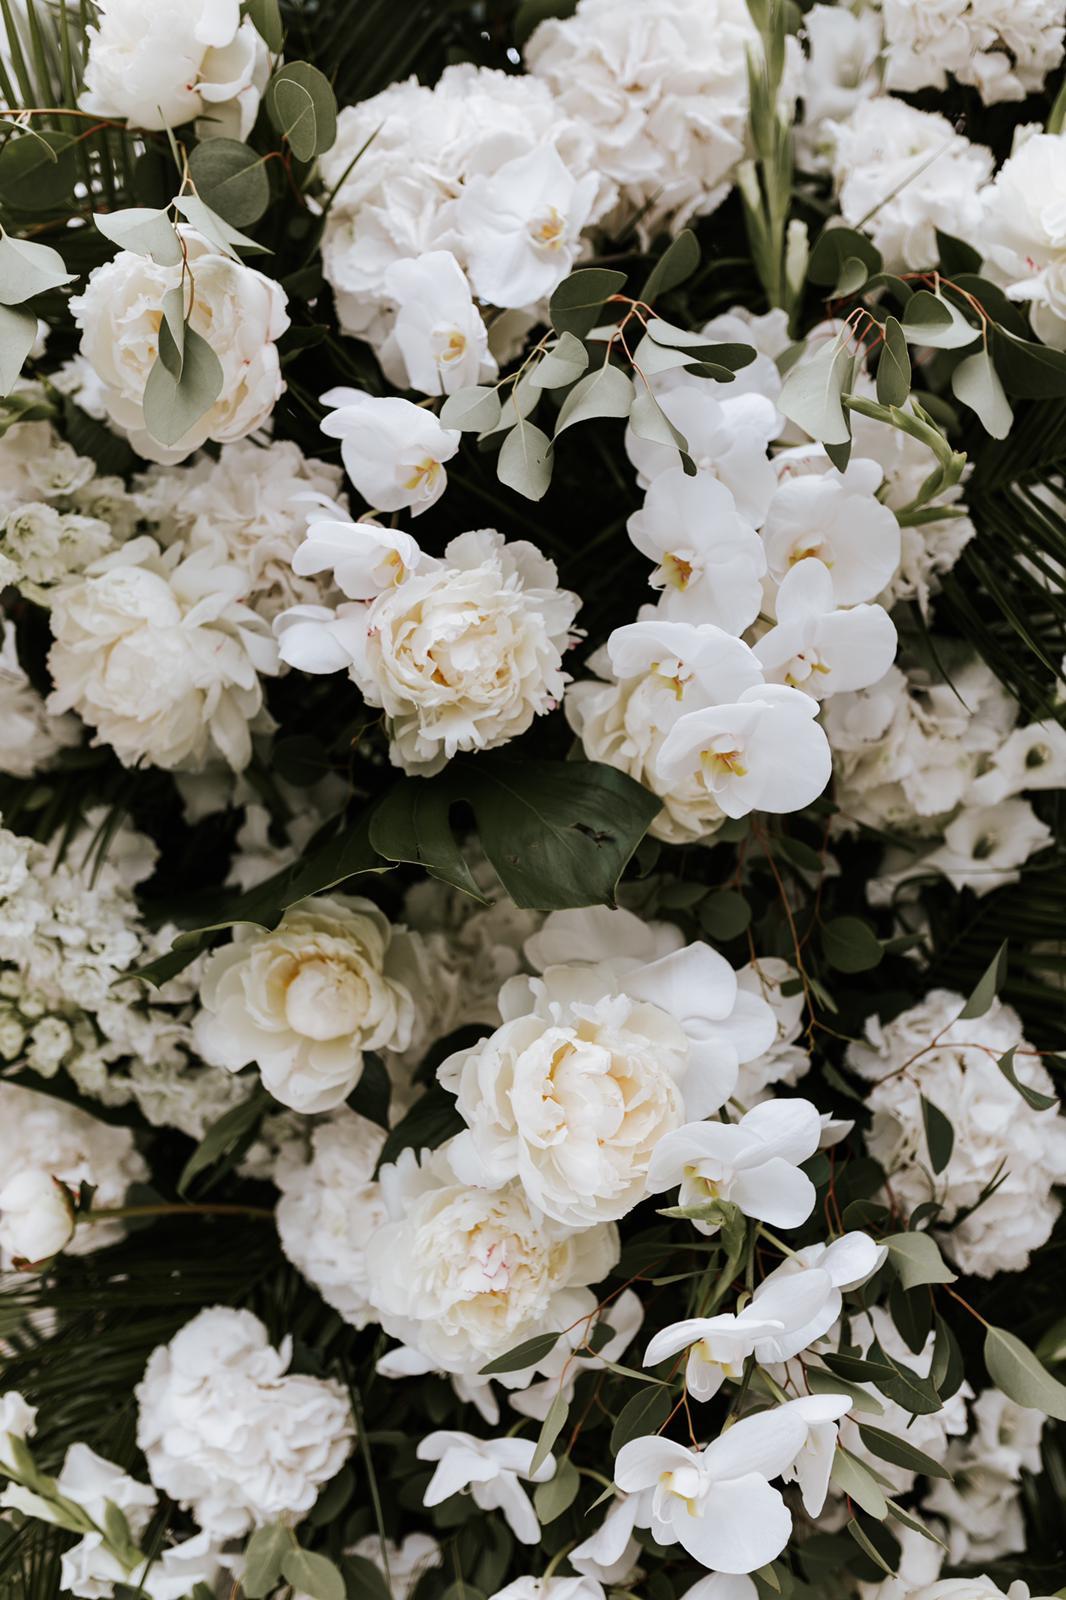 #apbloem #florist #bloemist #amsterdam #bloemenwinkel #kerkstraat #bloemen #flowers #weddingstyling #bruiloft #trouwen #liefde #bride #wedding #marriage #bruidsboeket #floraldesign #mordernwedding #modernbride #greenhouse #kas #planten #styling #interiorstyling #white #wit